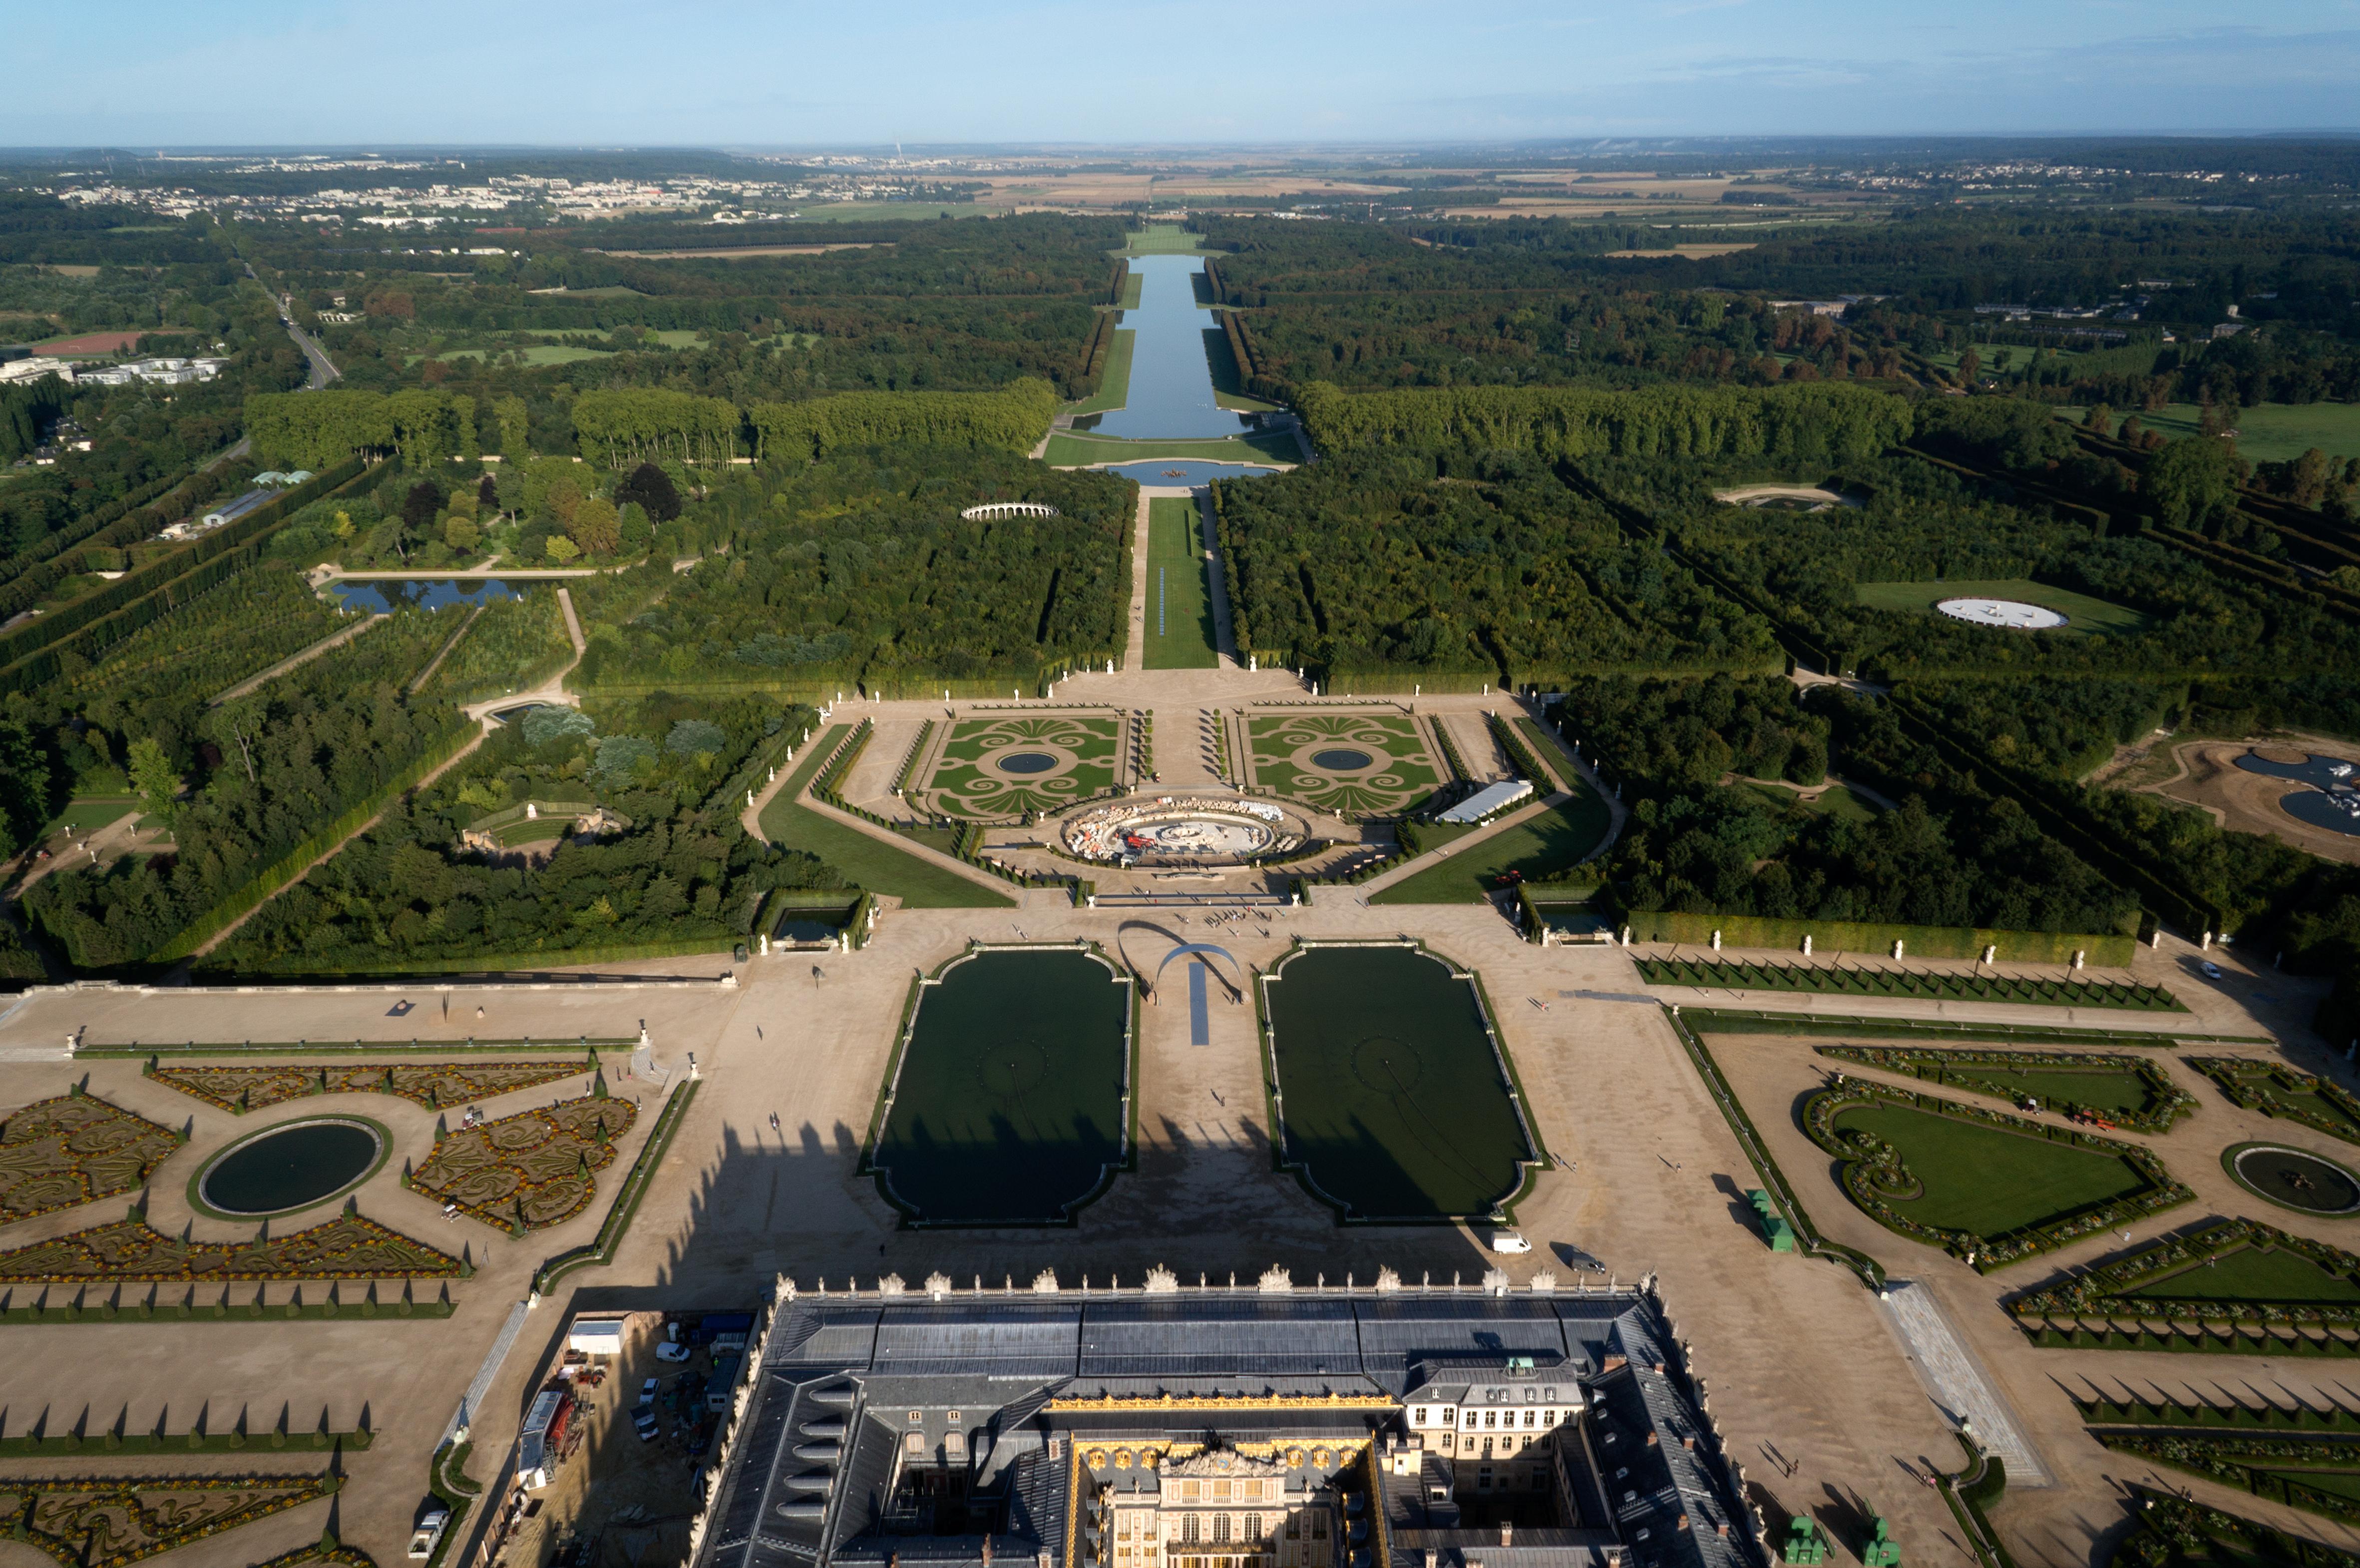 Gardens of Versailles - Wikipedia